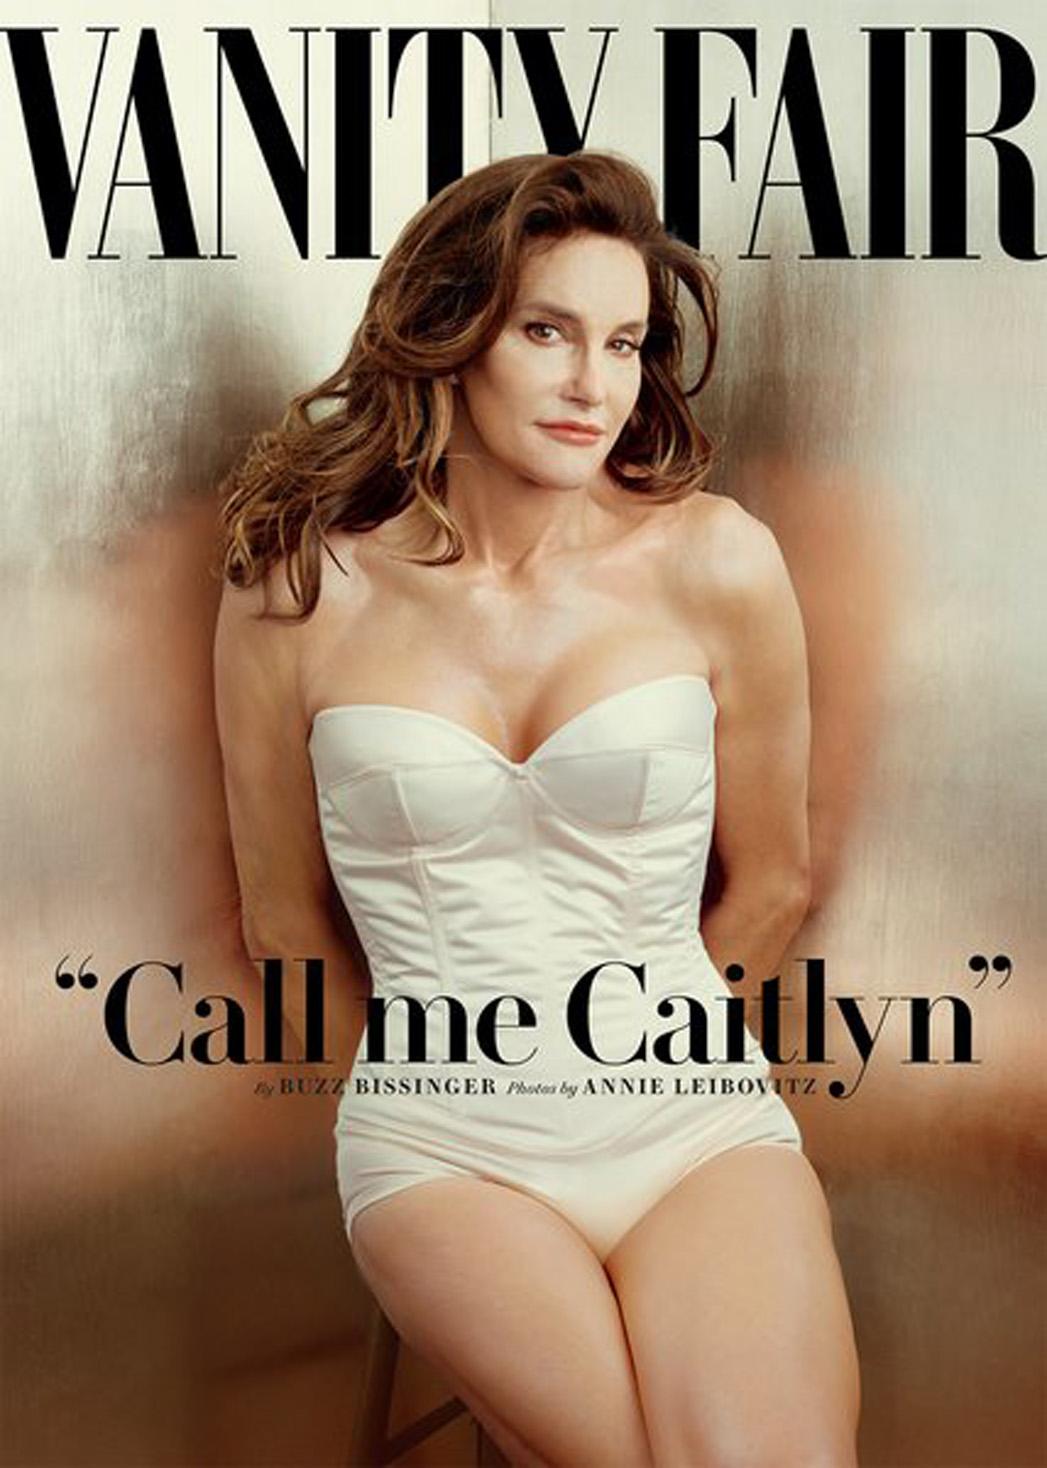 Bruce Caitlyn Jenner Vanity Fair Cover - P 2015